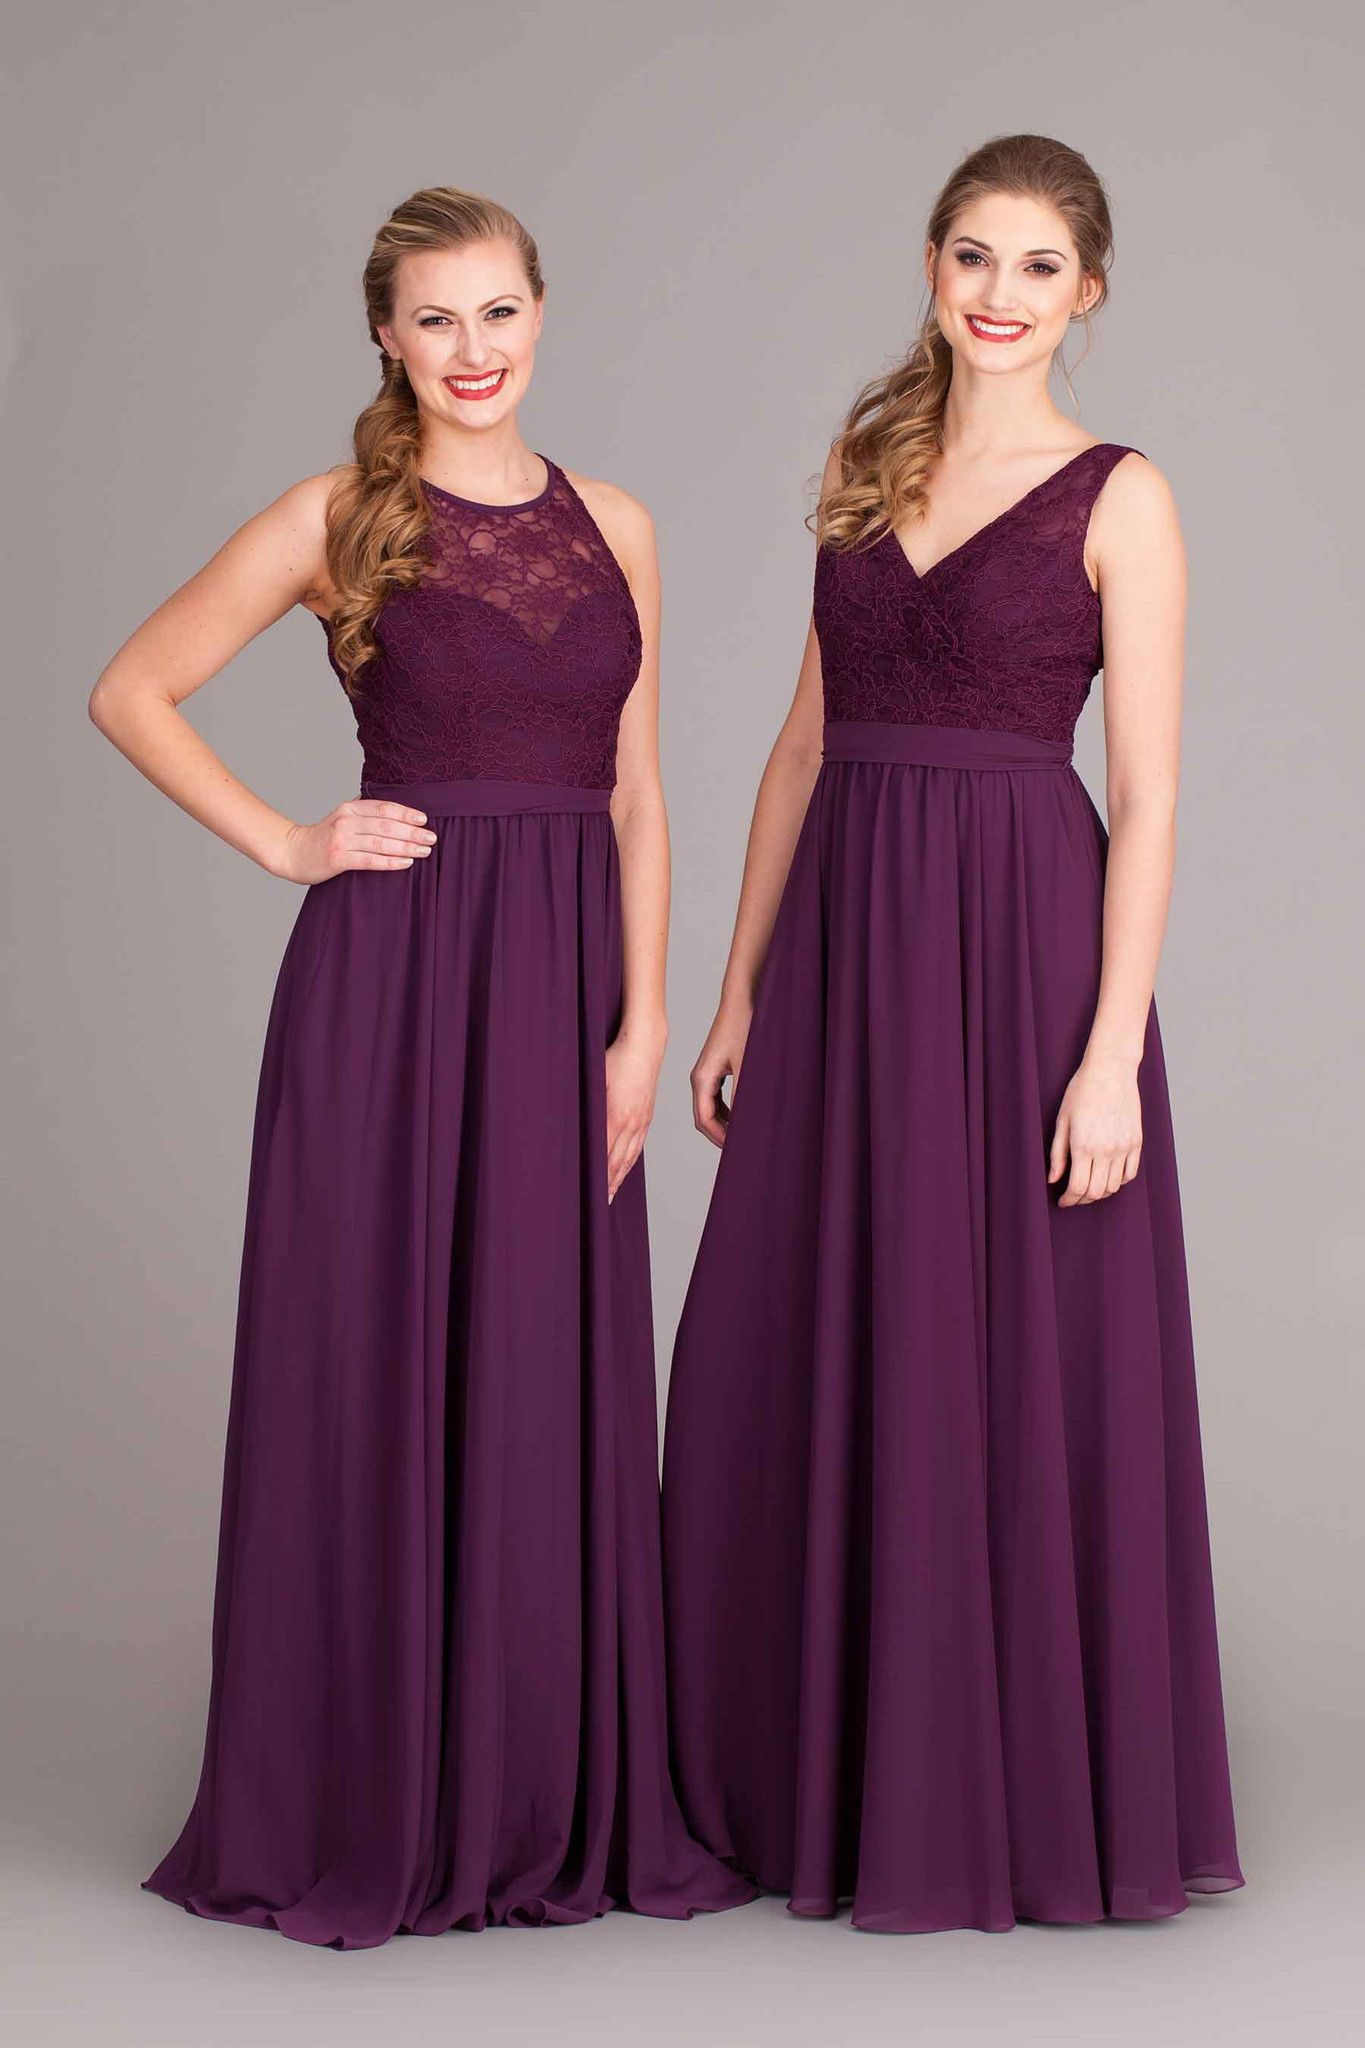 Delilah   Chiffon bridesmaid dresses, Eggplants and Elegant